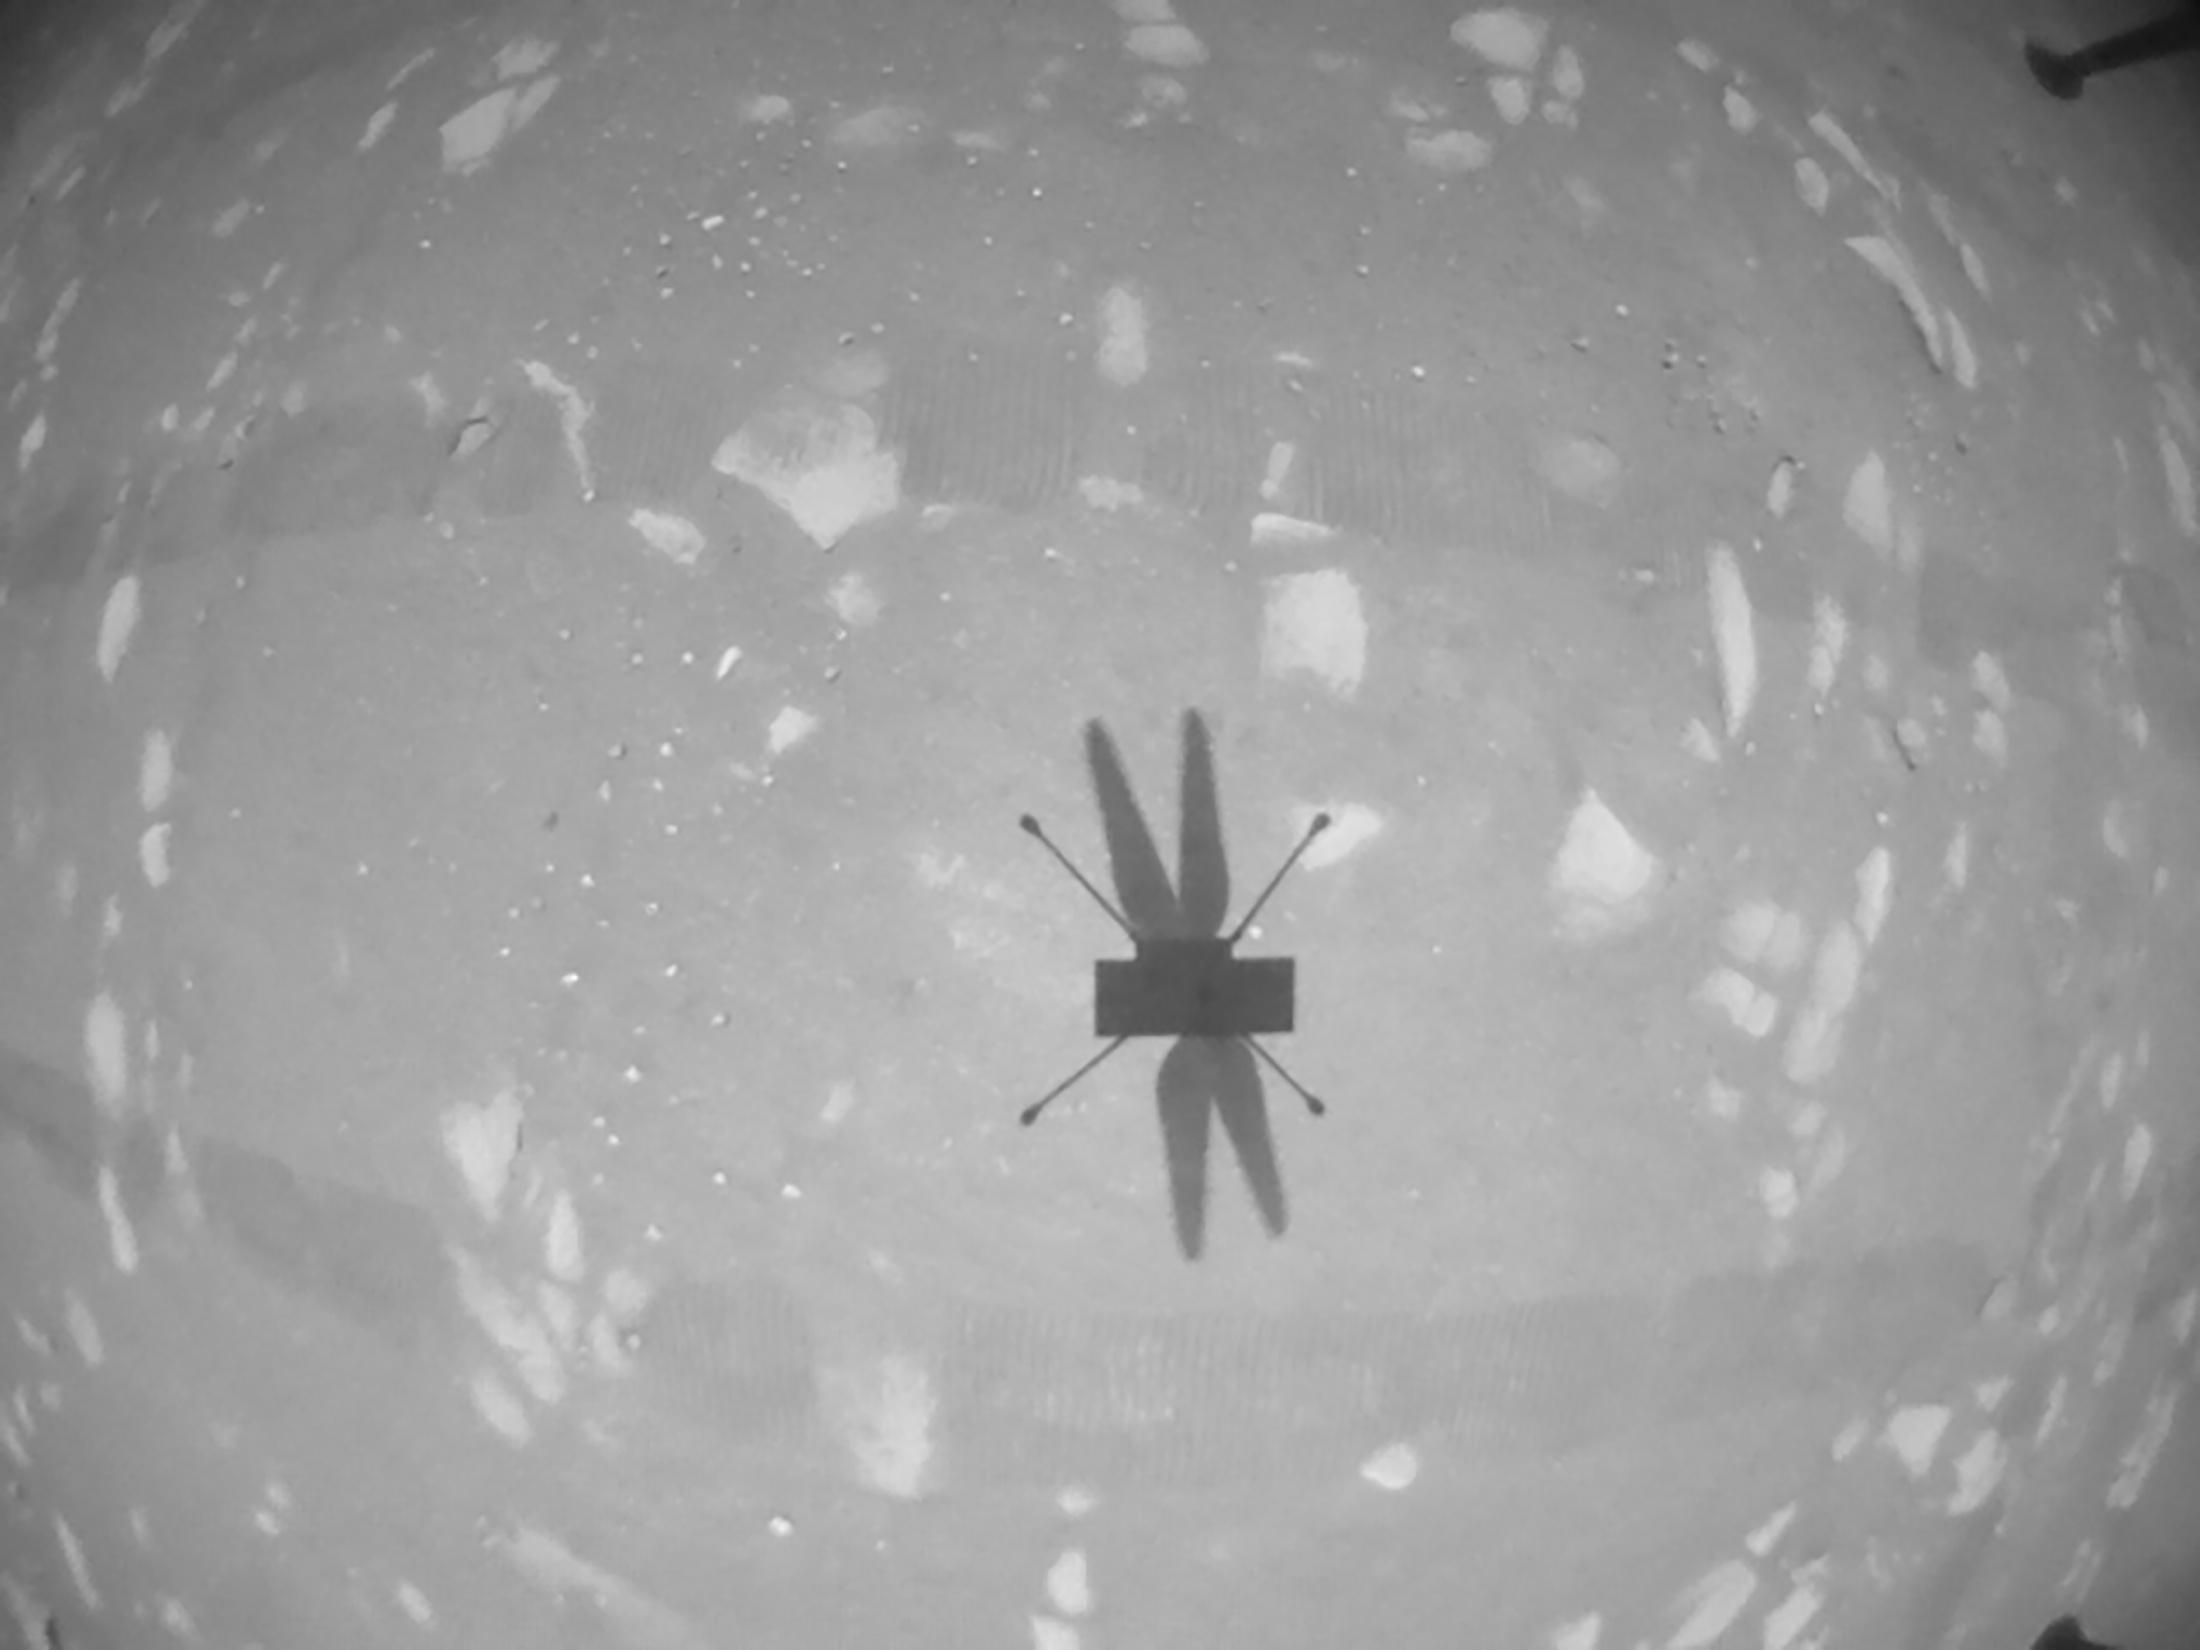 Perseverance: Δεύτερη πτήση για το ελικοπτεράκι στον πλανήτη Άρη